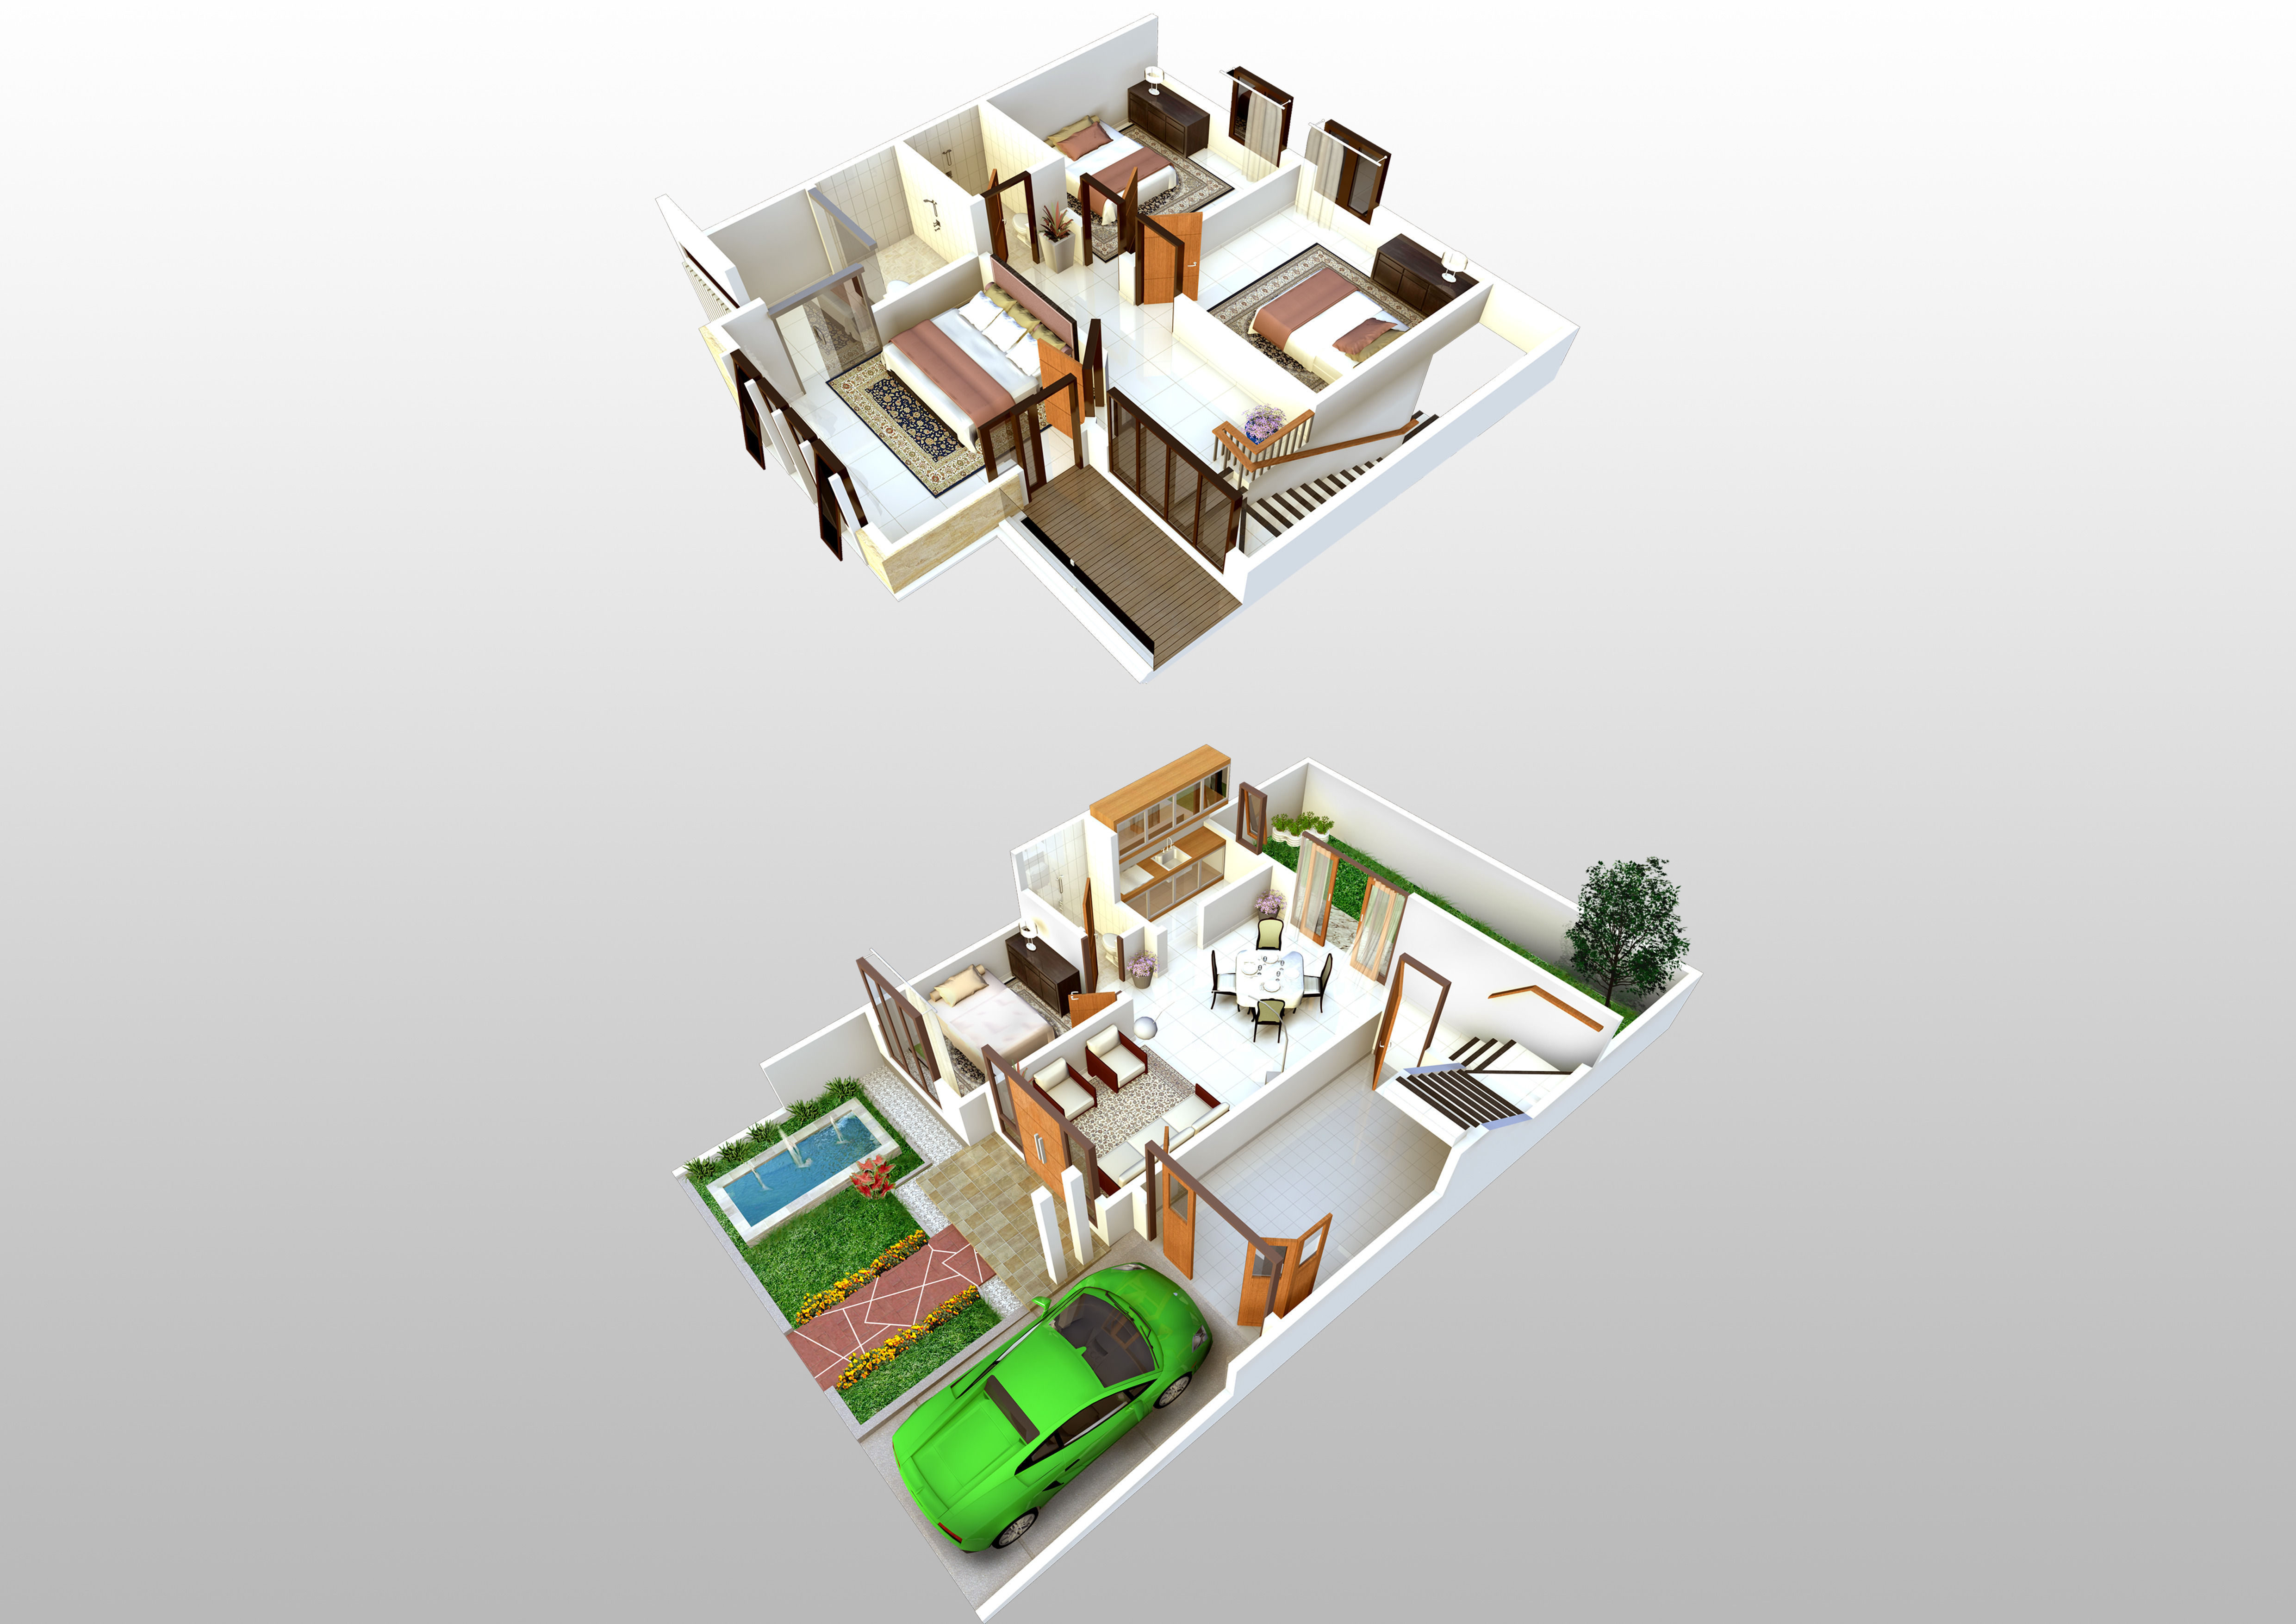 3d Floorplan Of 2 Storey House Model Skp 1